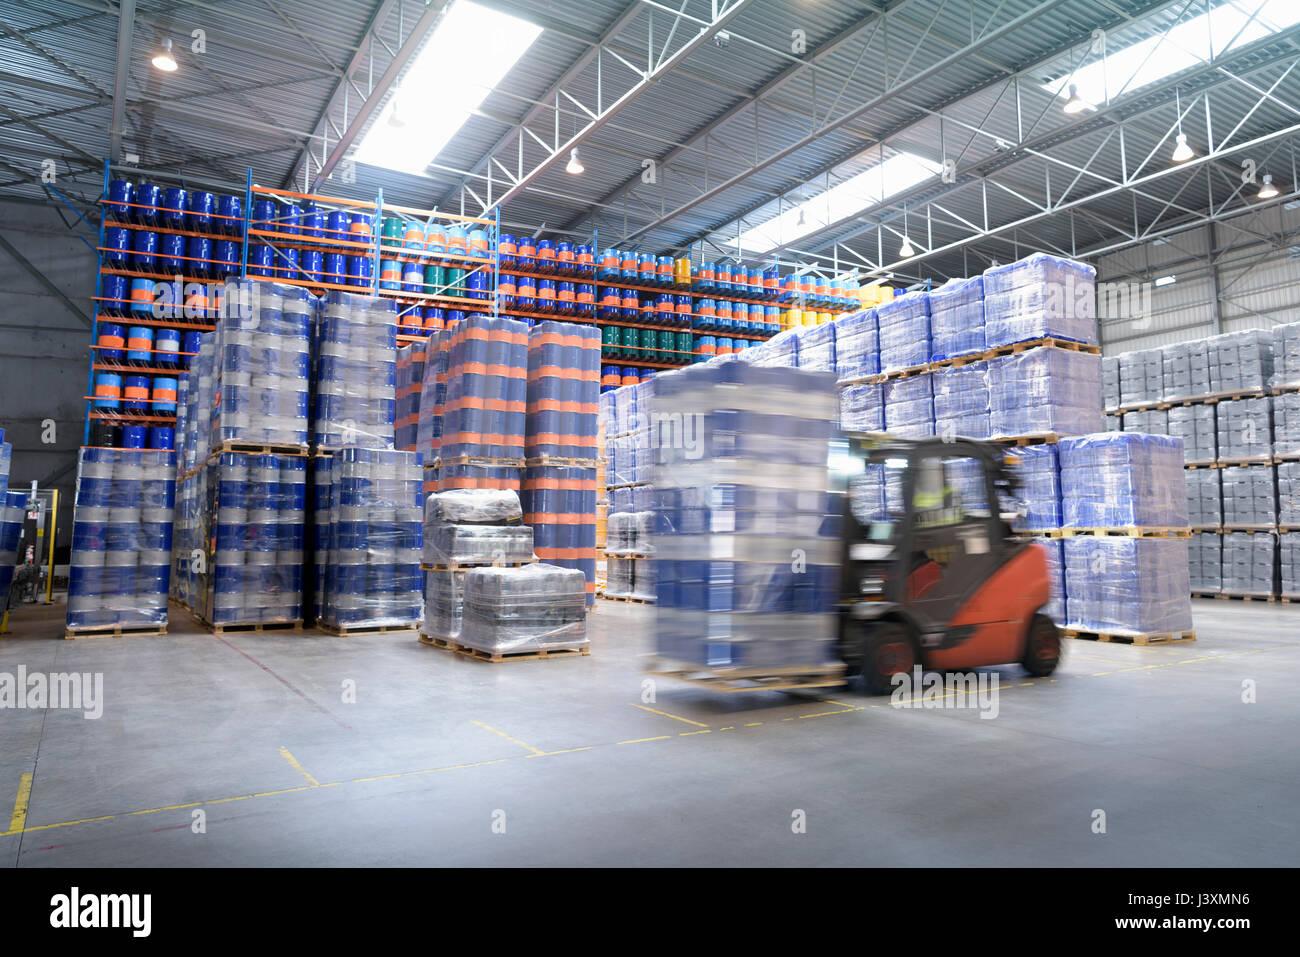 Forklift truck storing barrels in oil blending factory - Stock Image